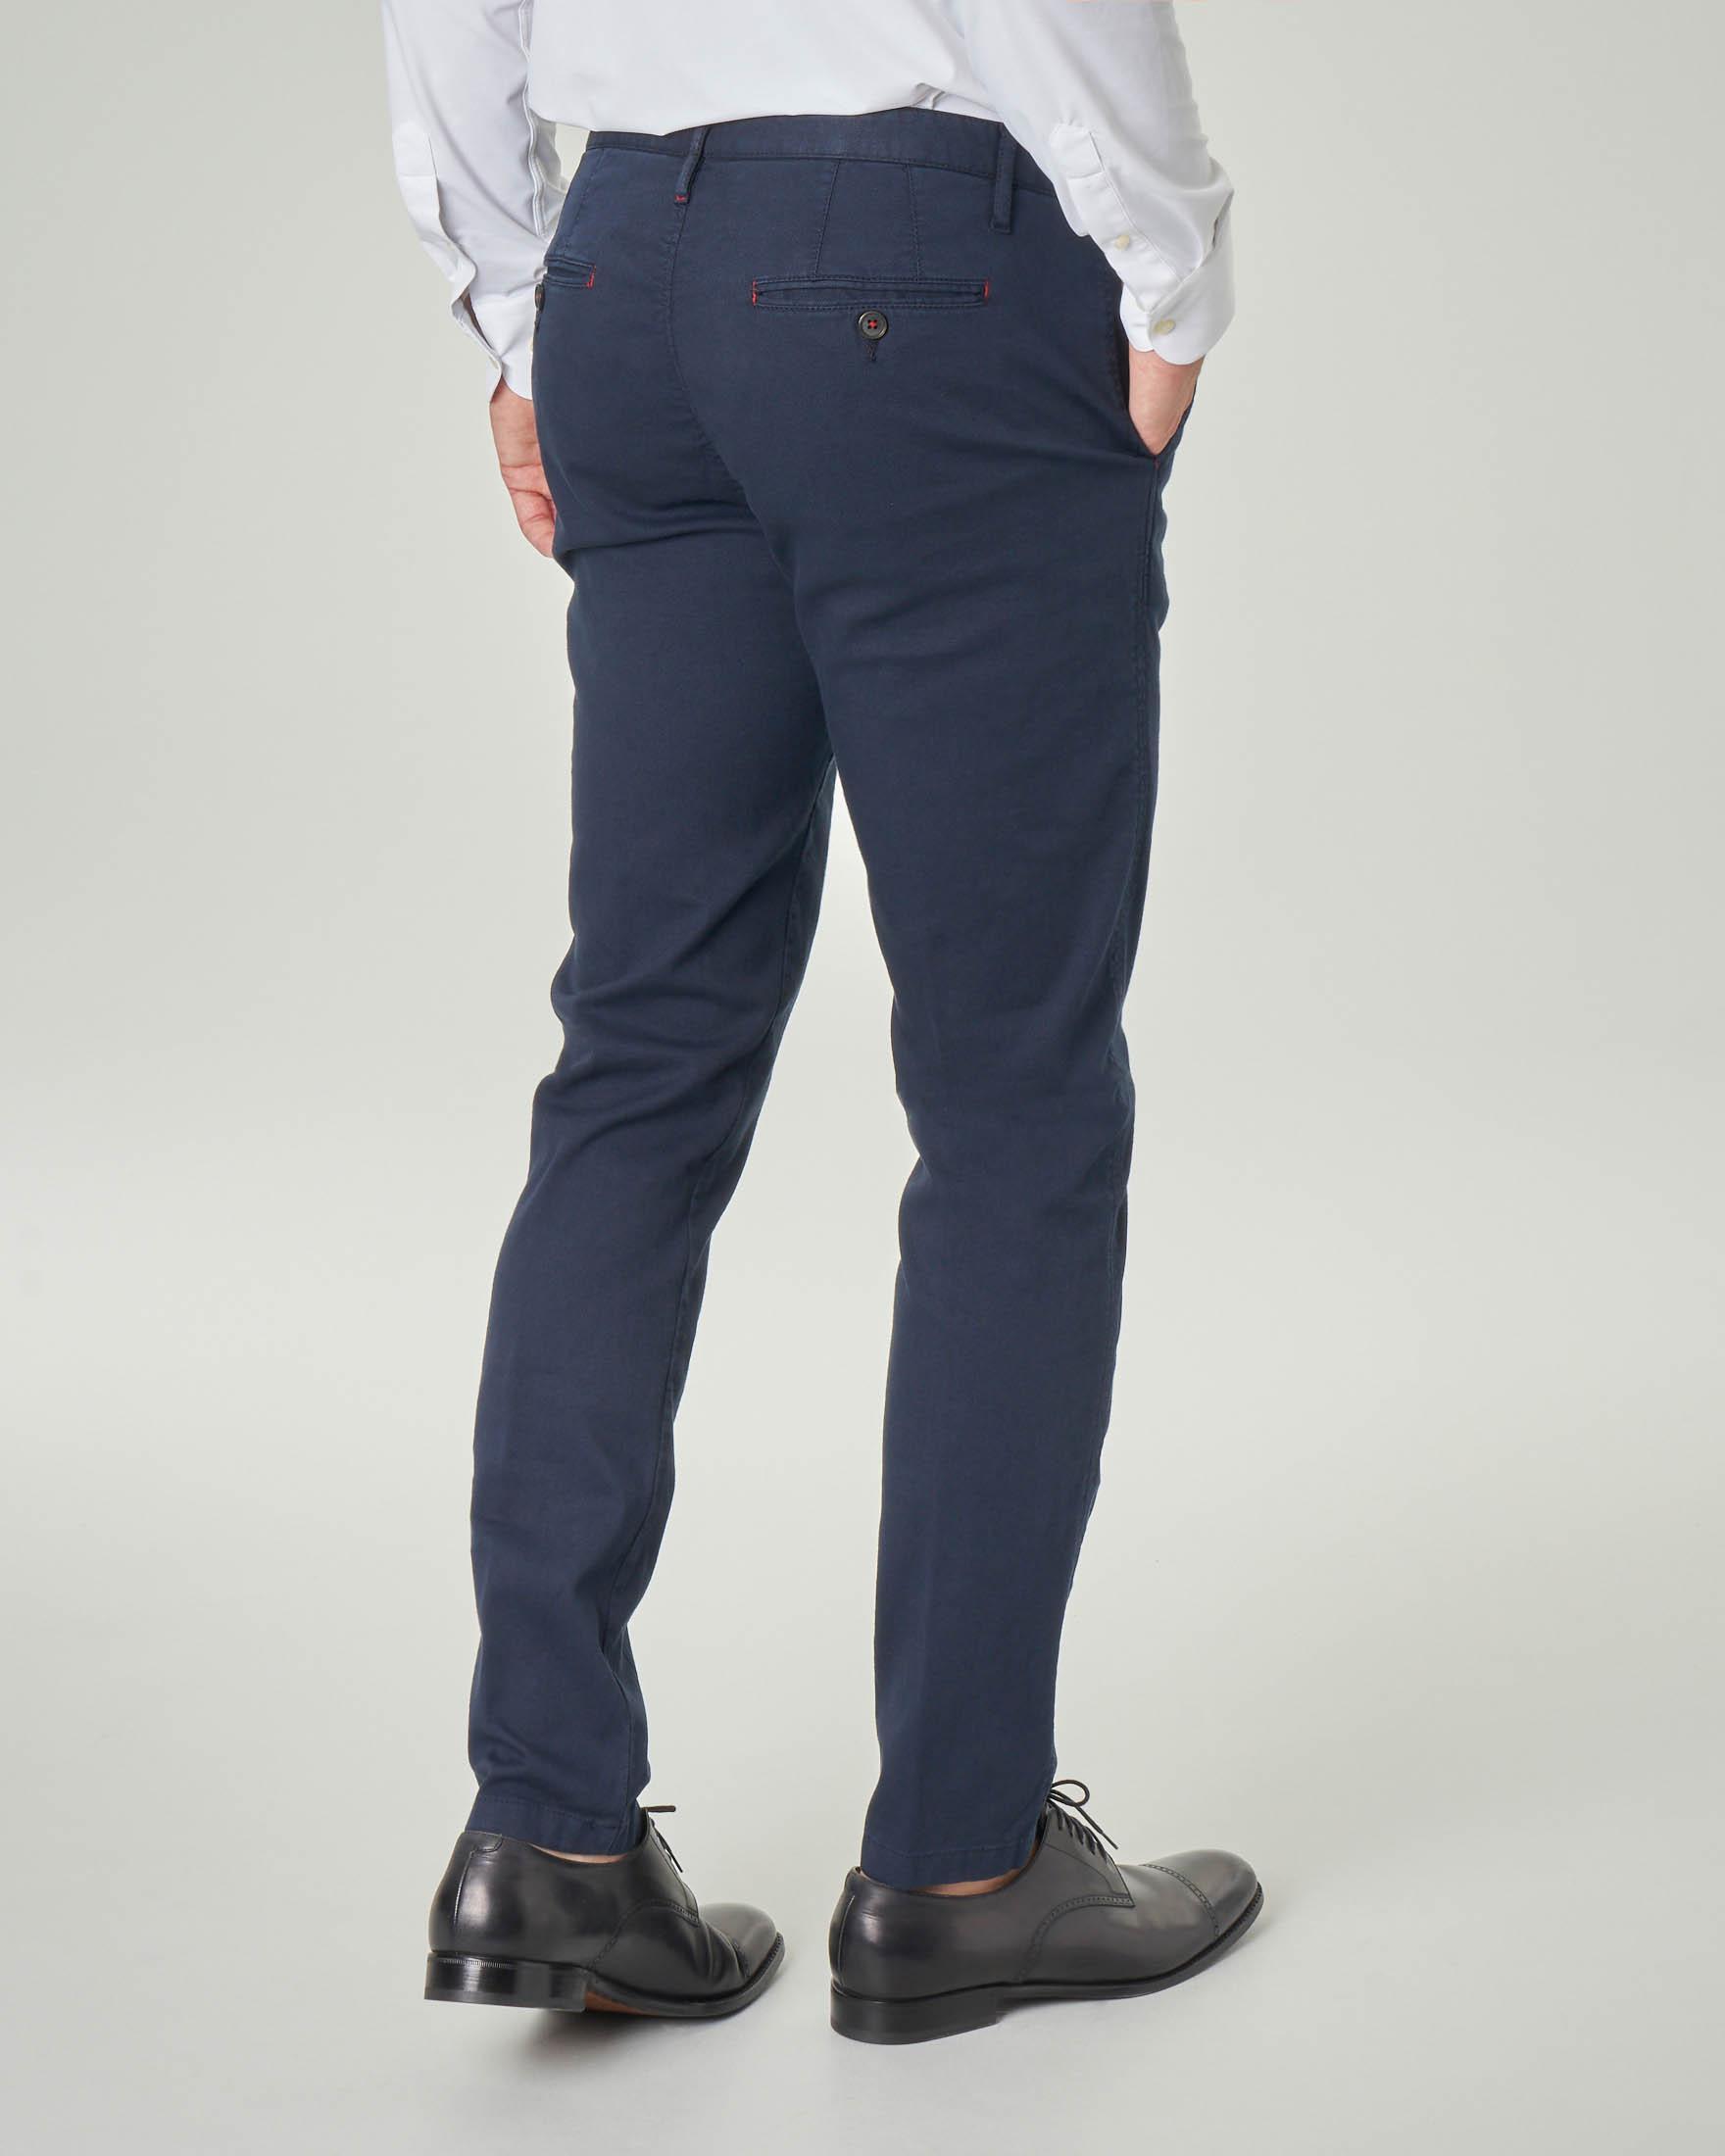 Pantalone chino blu in cotone stretch tinta unita